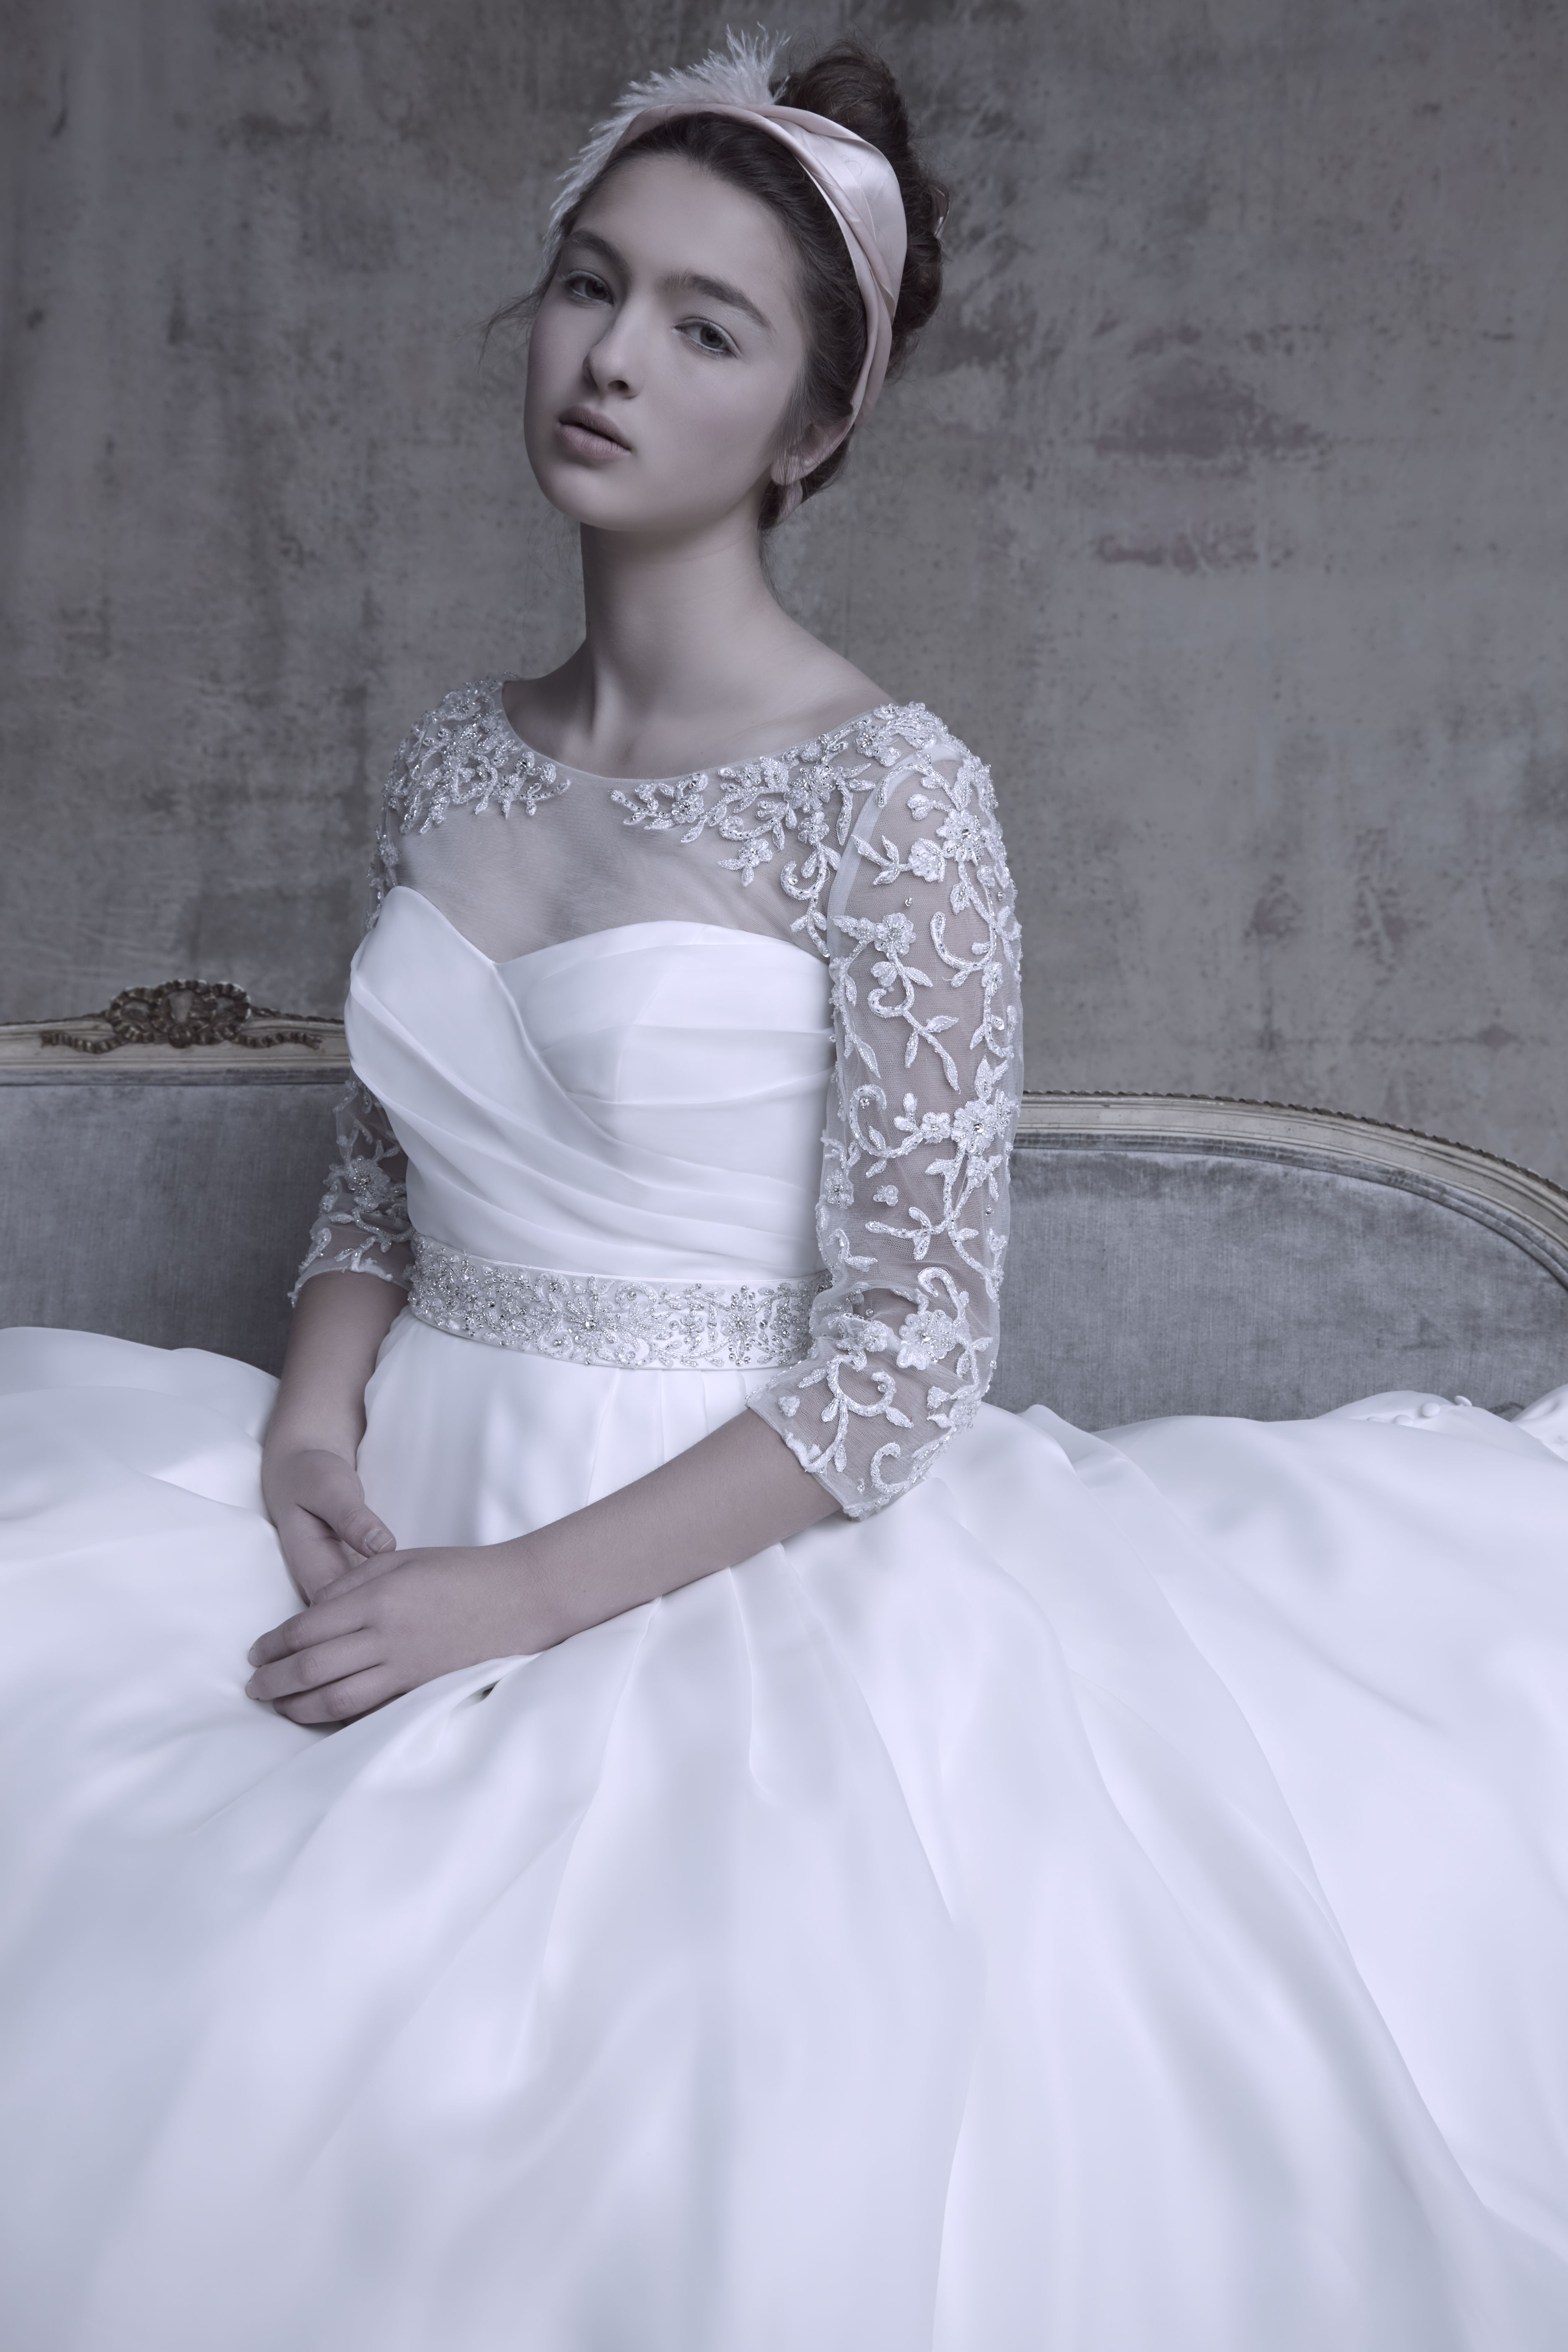 Sophia\'s Gowns Keller, TX | Wedding Dresses at Sophia\'s Gowns ...